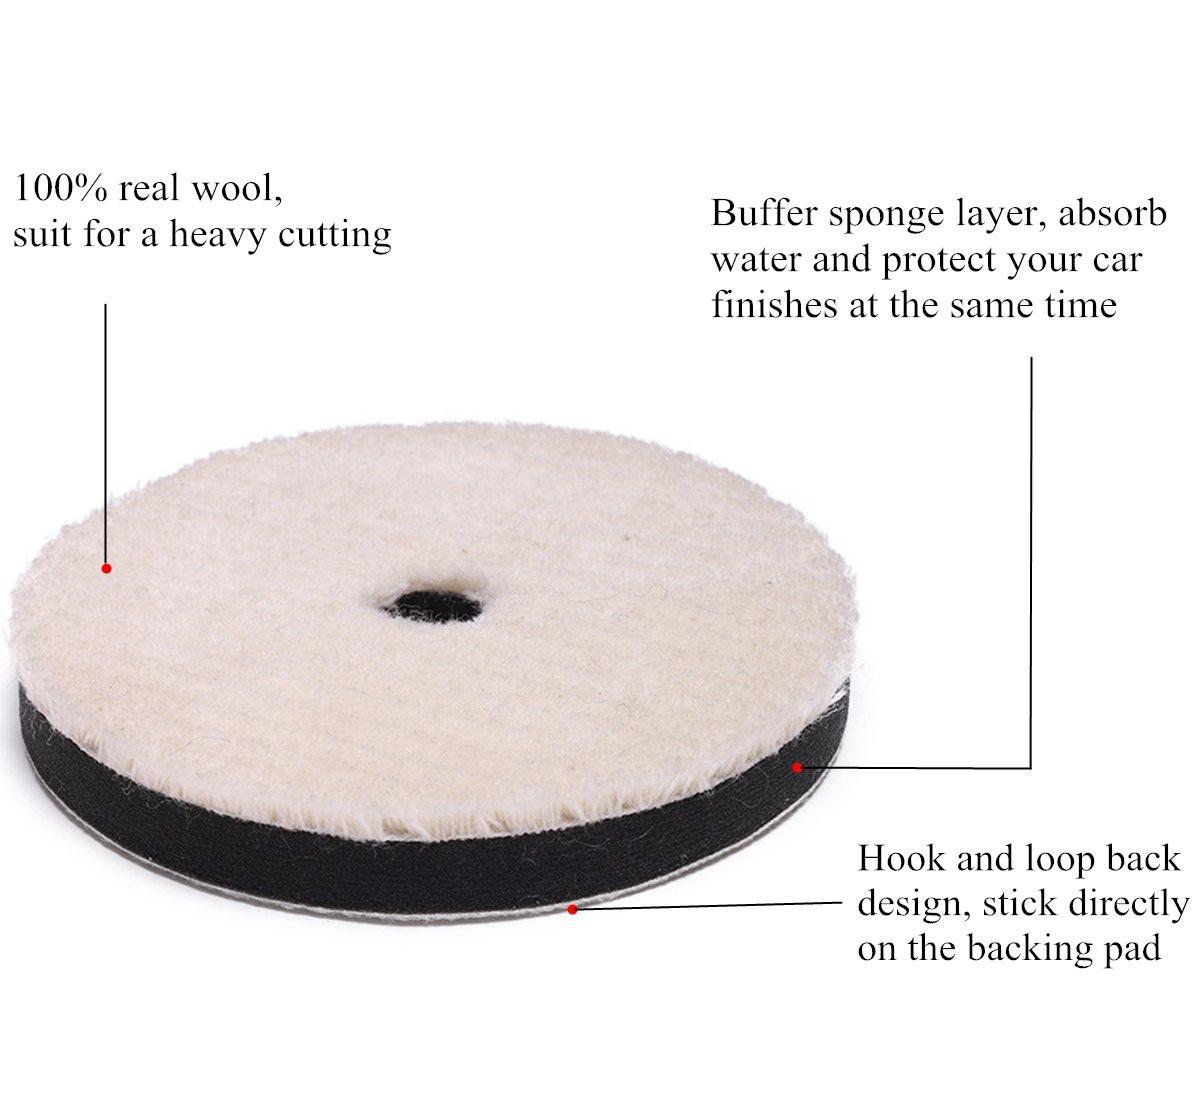 OKAYDA 100/% Wool Polishing Pad with Sponge Buffer and Hook /& Loop Back Wool Waxing Pad for Auto Car 5 2pack